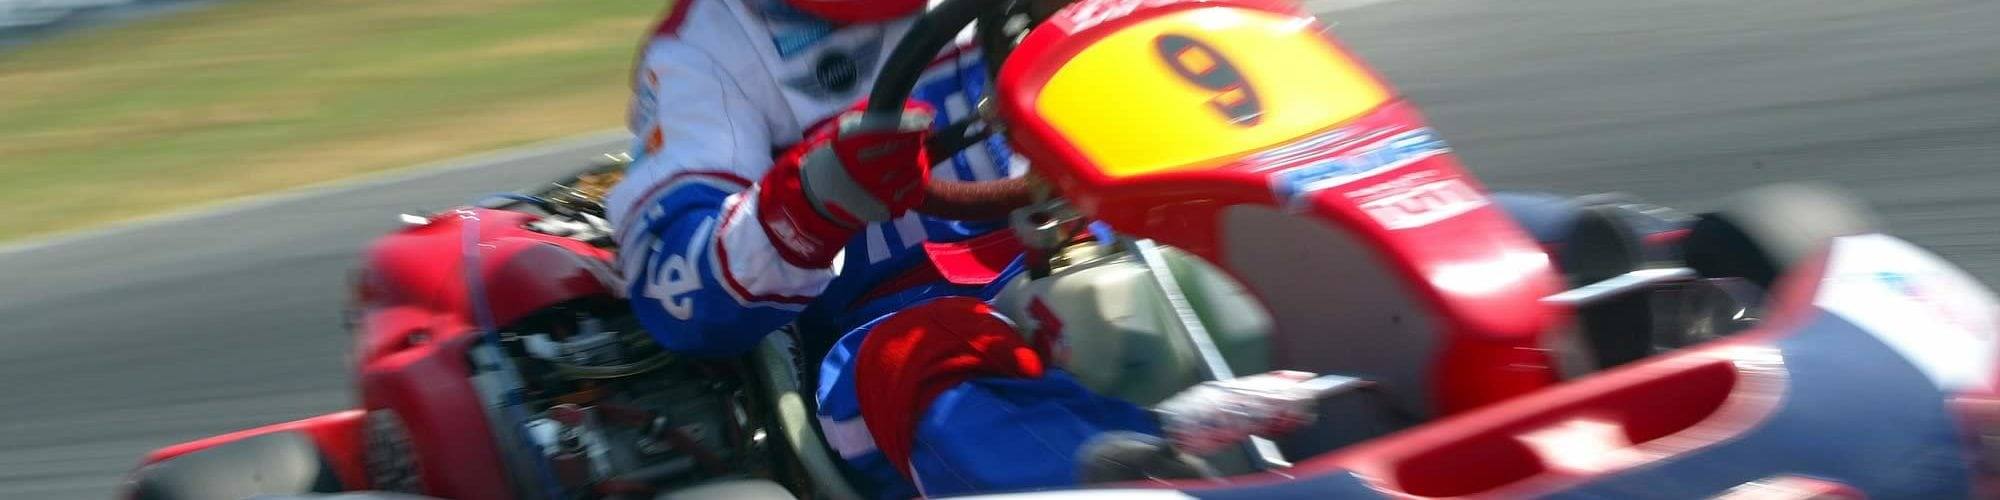 faire-du-kart-miami-karting-circuit-une